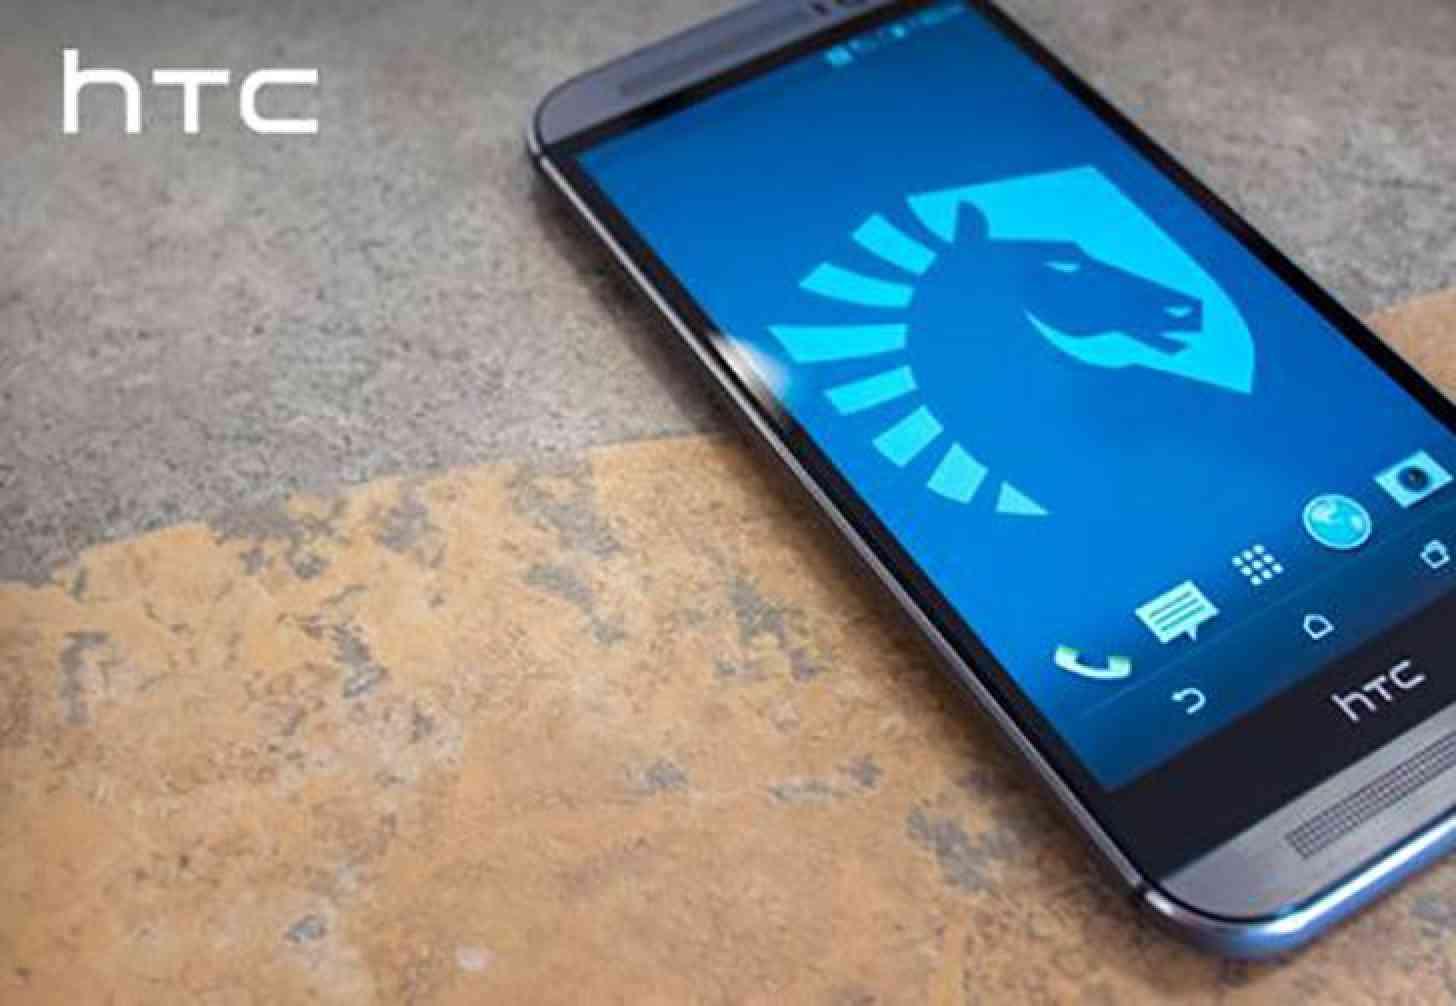 HTC e-sports Team Liquid sponsorship